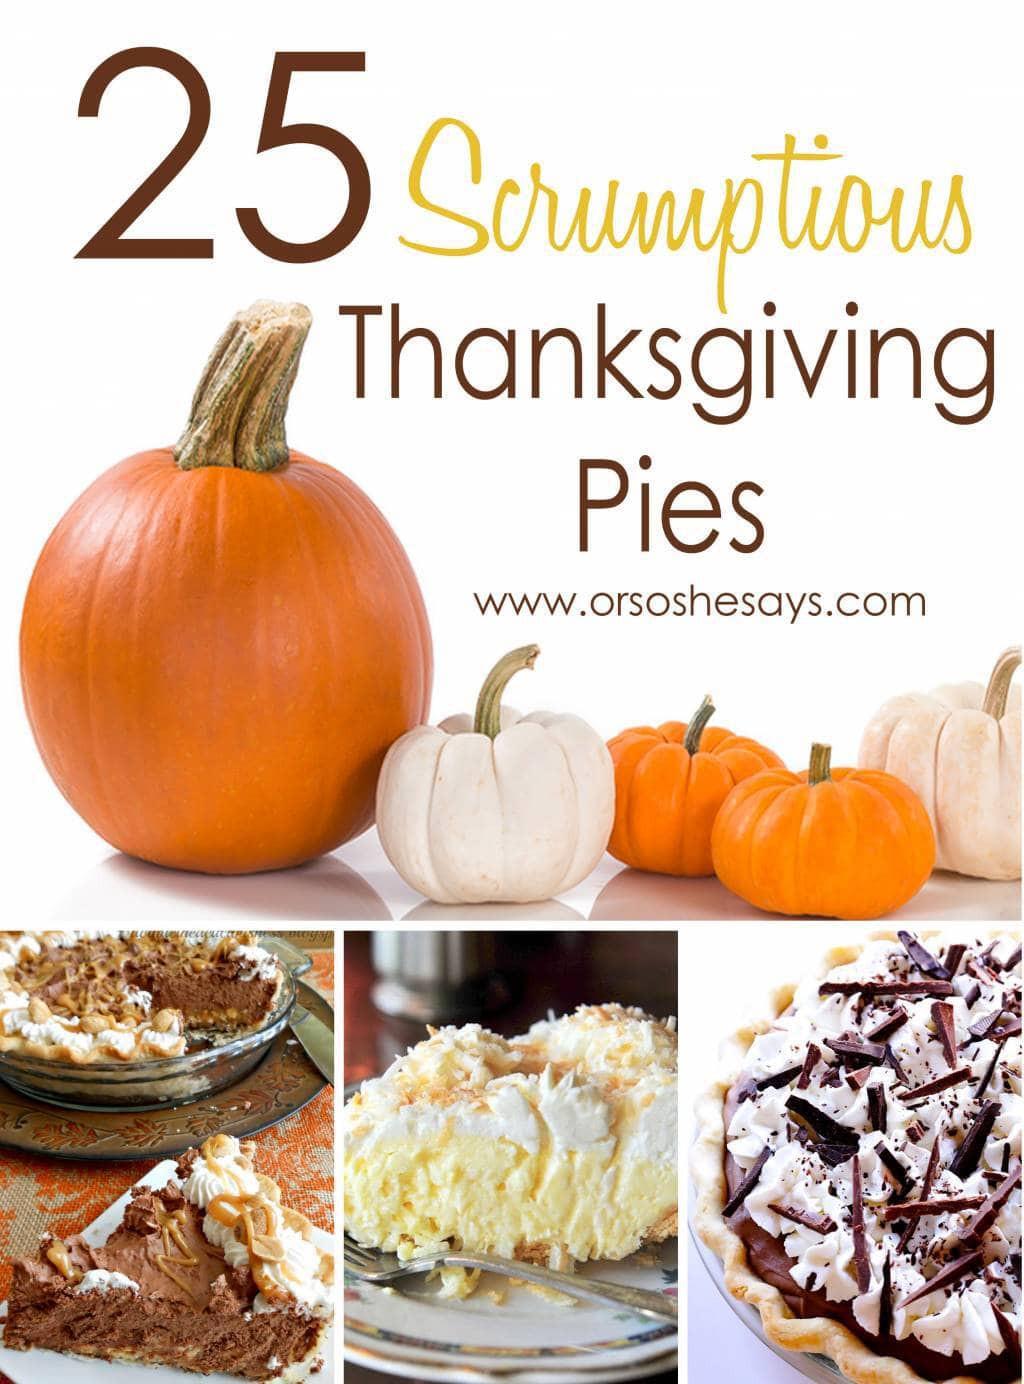 Best Thanksgiving Pies  25 Scrumptious Thanksgiving Pies she Mariah so she